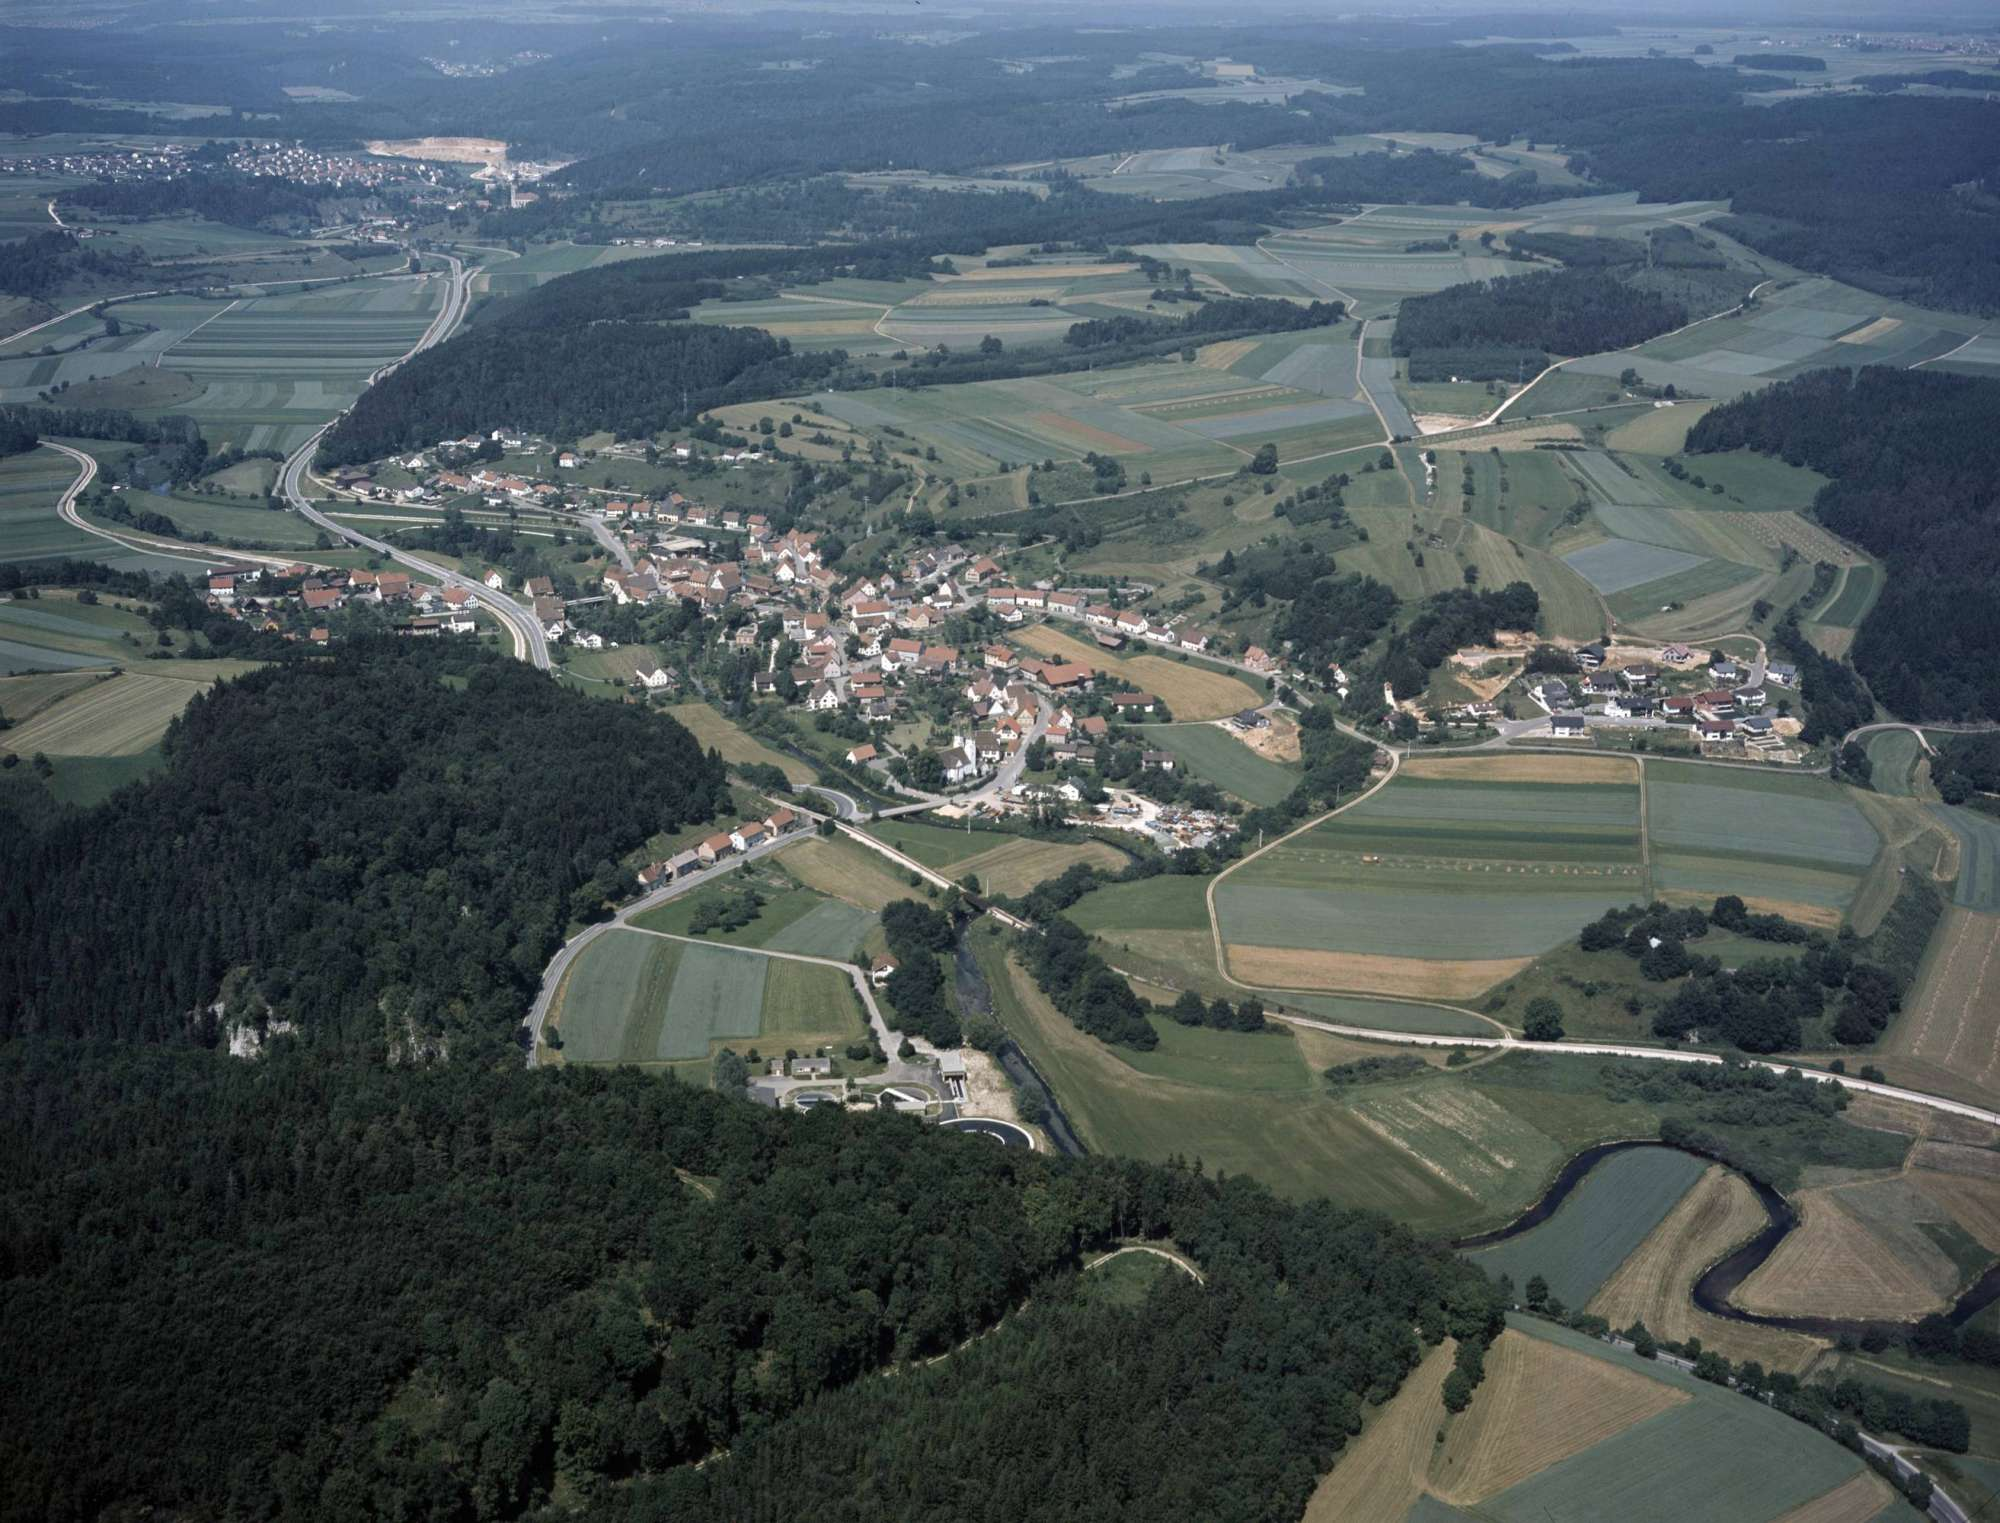 Veringendorf, Luftbild, Bild 1